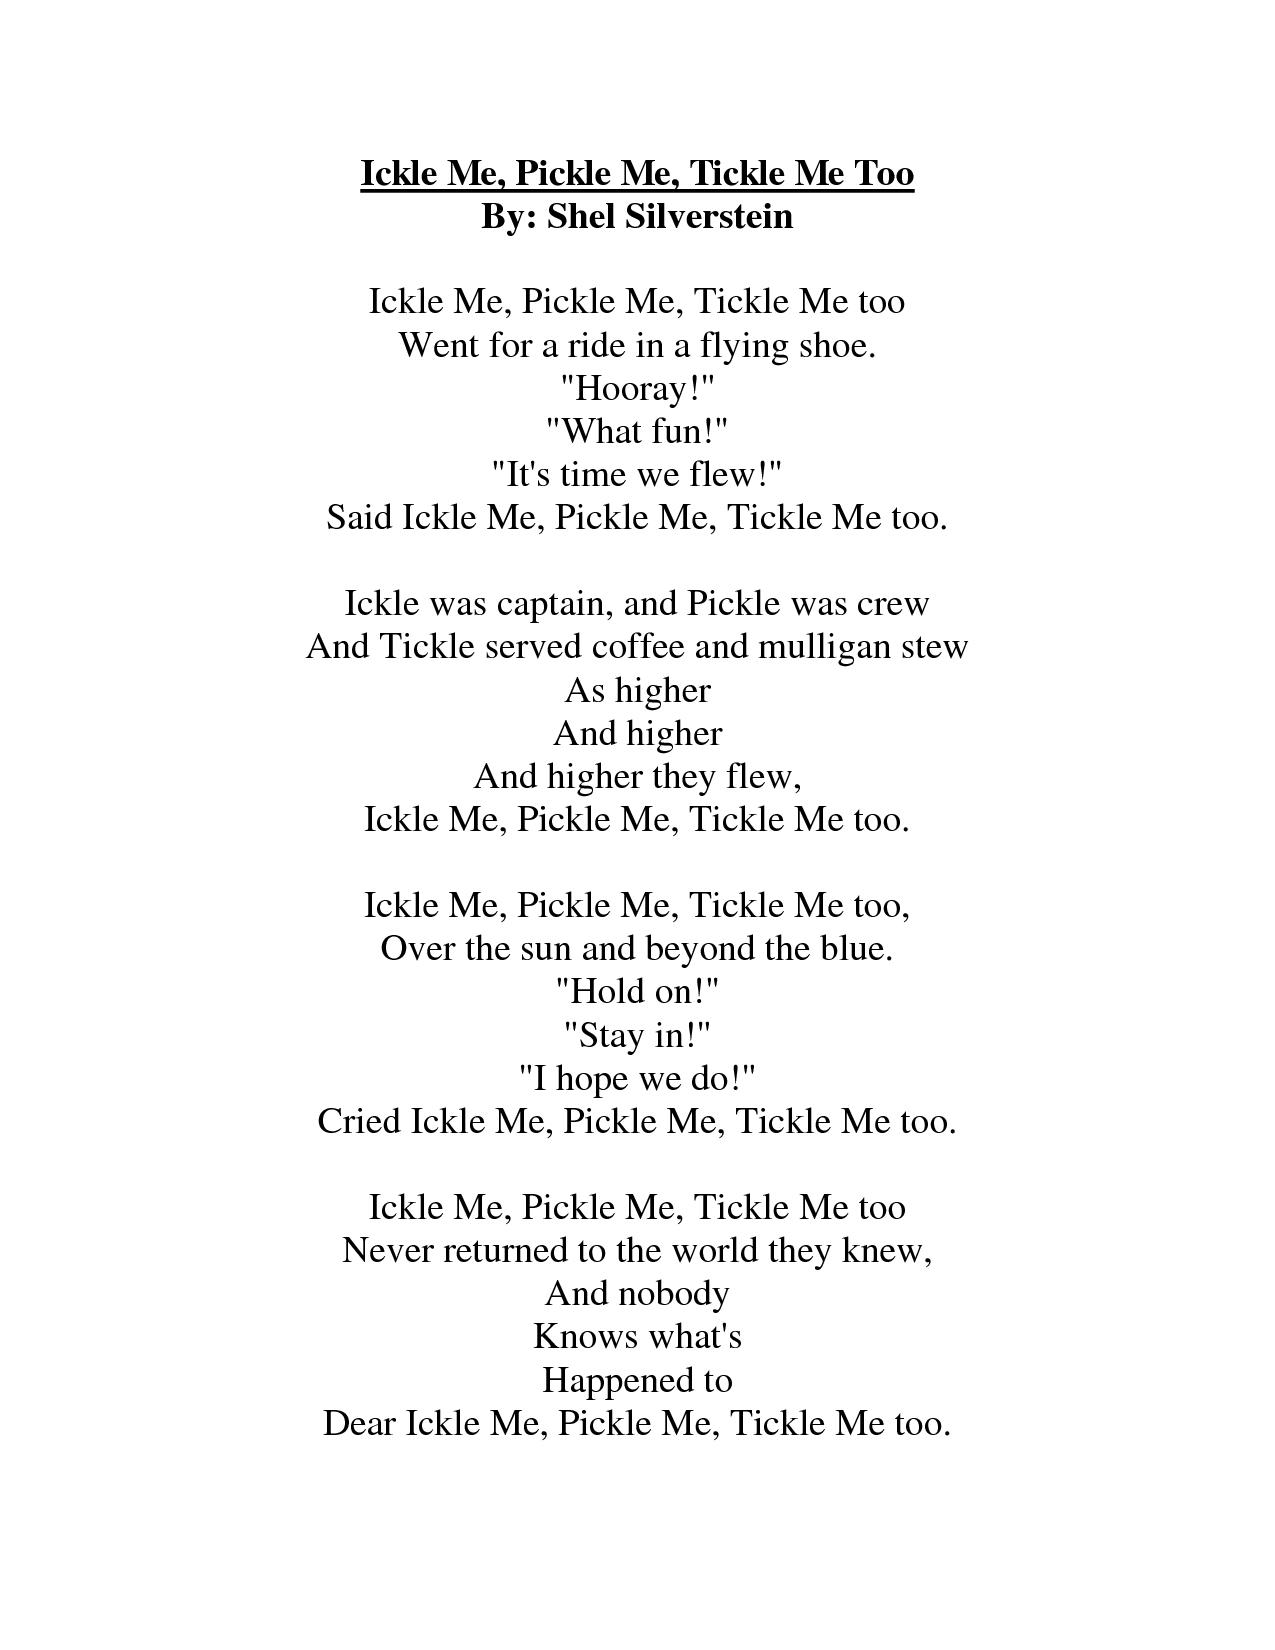 shel silverstein | Quotes | Shel silverstein poems, Shel